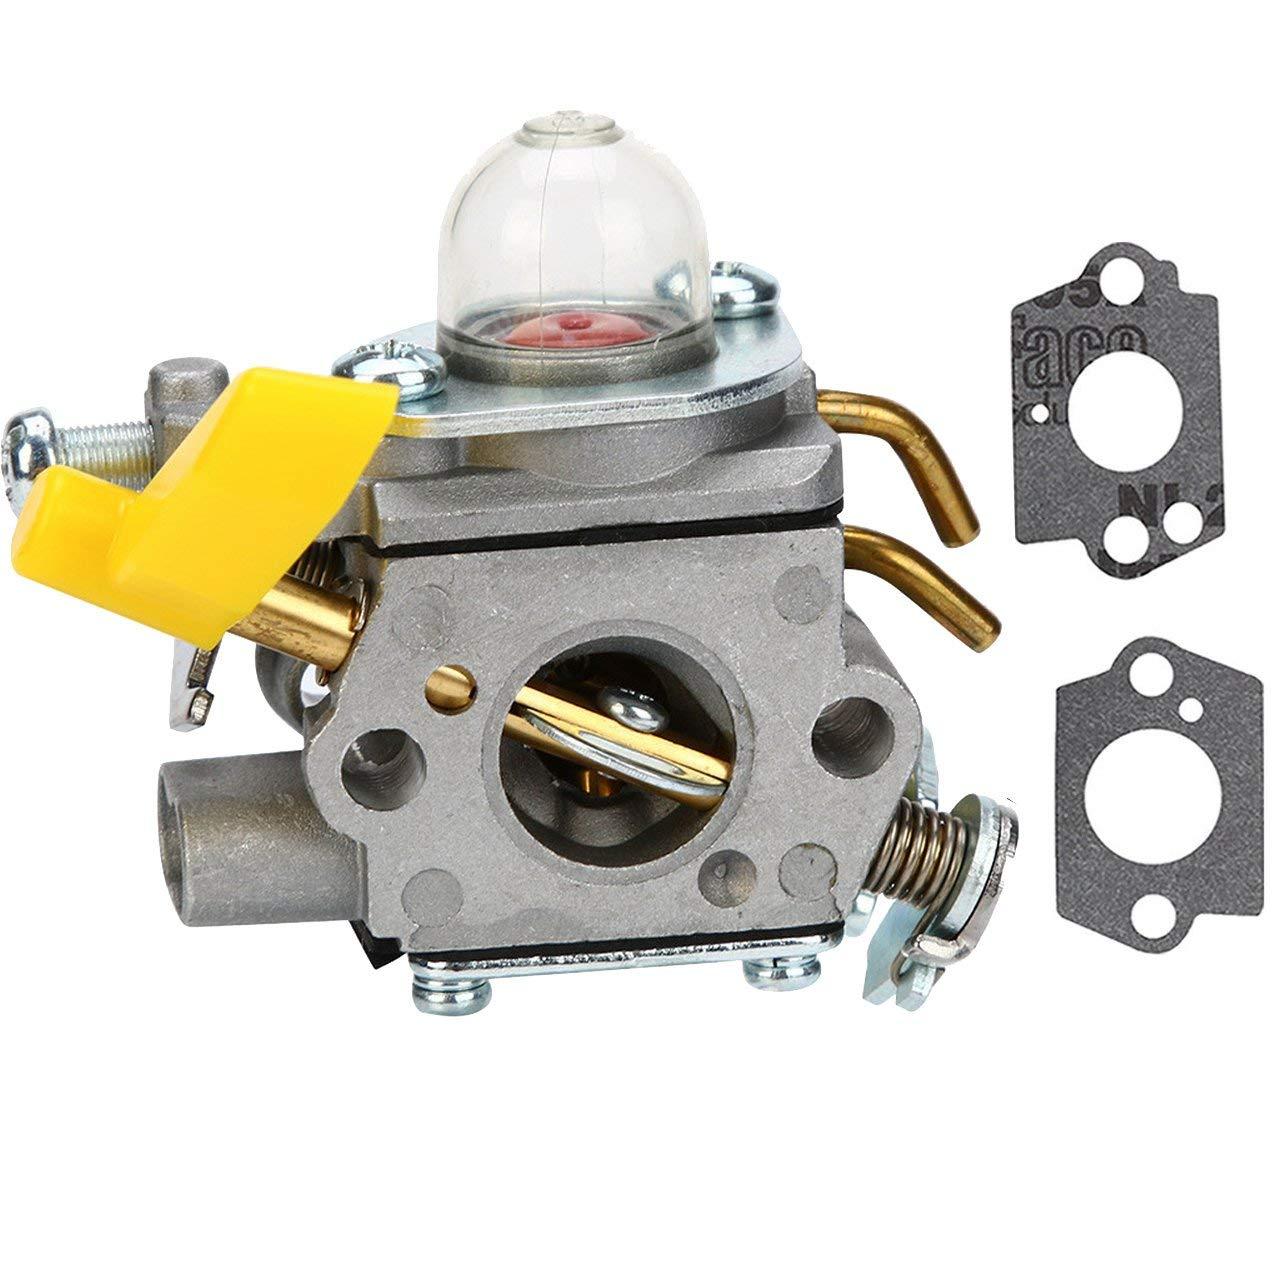 Get Quotations · FYIYI New C1U-H60 Carburetor for 25cc 26cc 30cc Ryobi  Homelite String Trimmer Brush Cutter